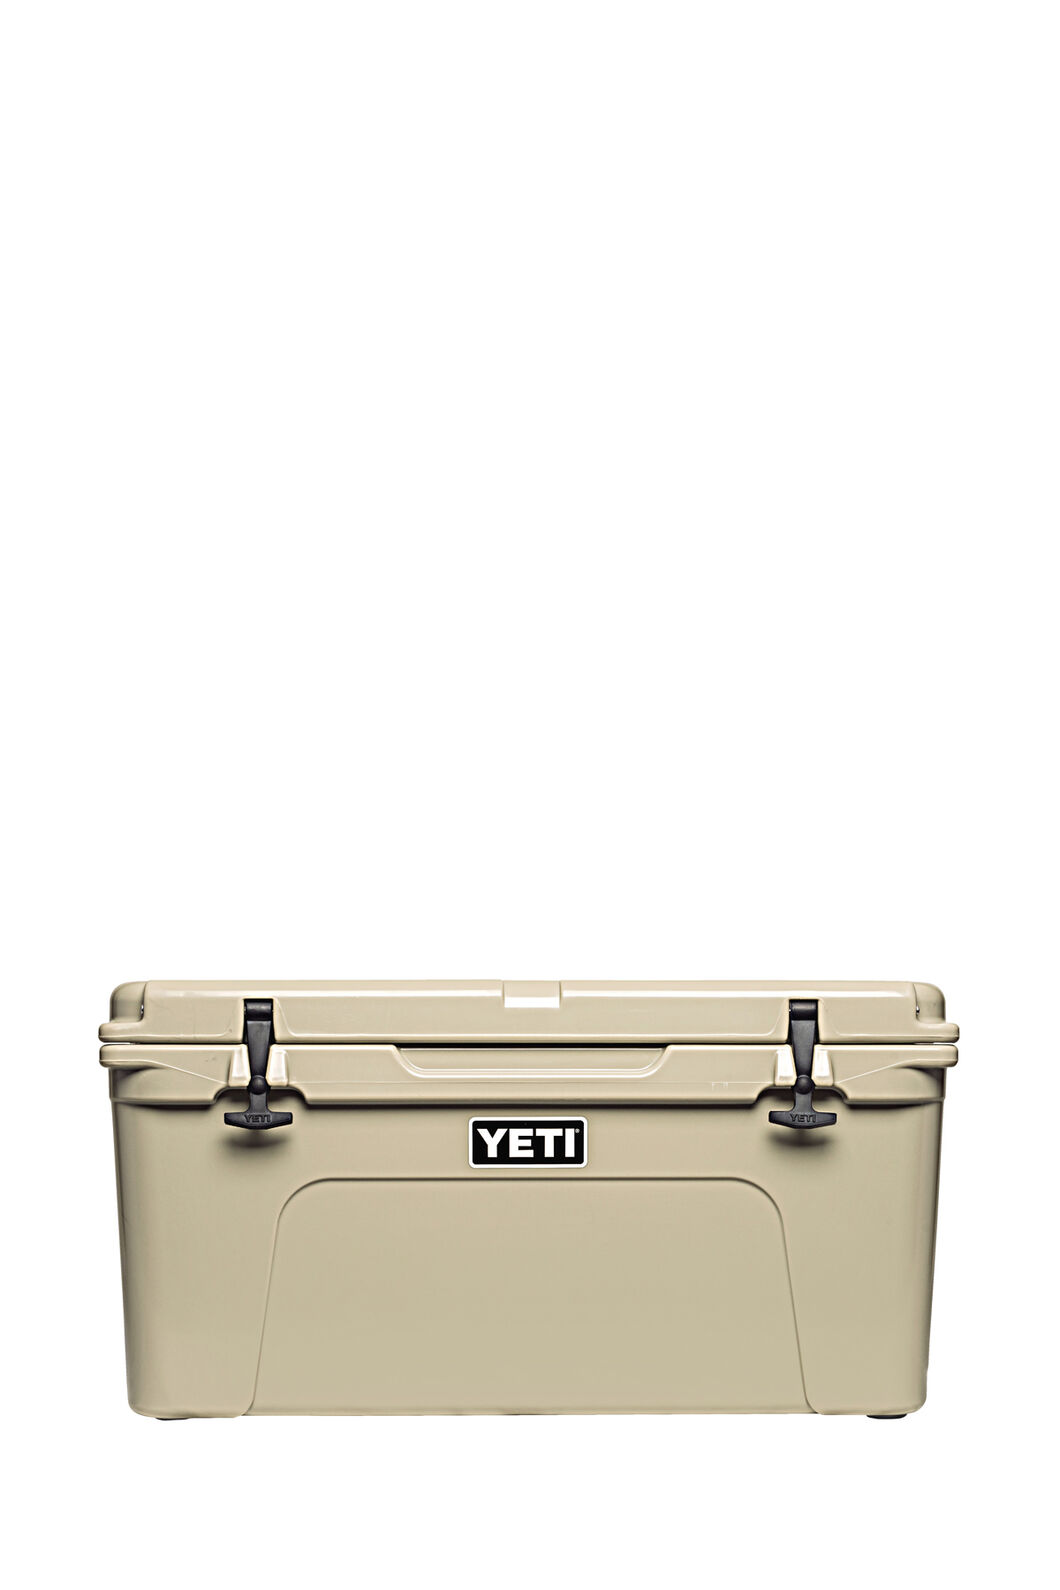 YETI® Tundra 65 Hard Cooler, None, hi-res